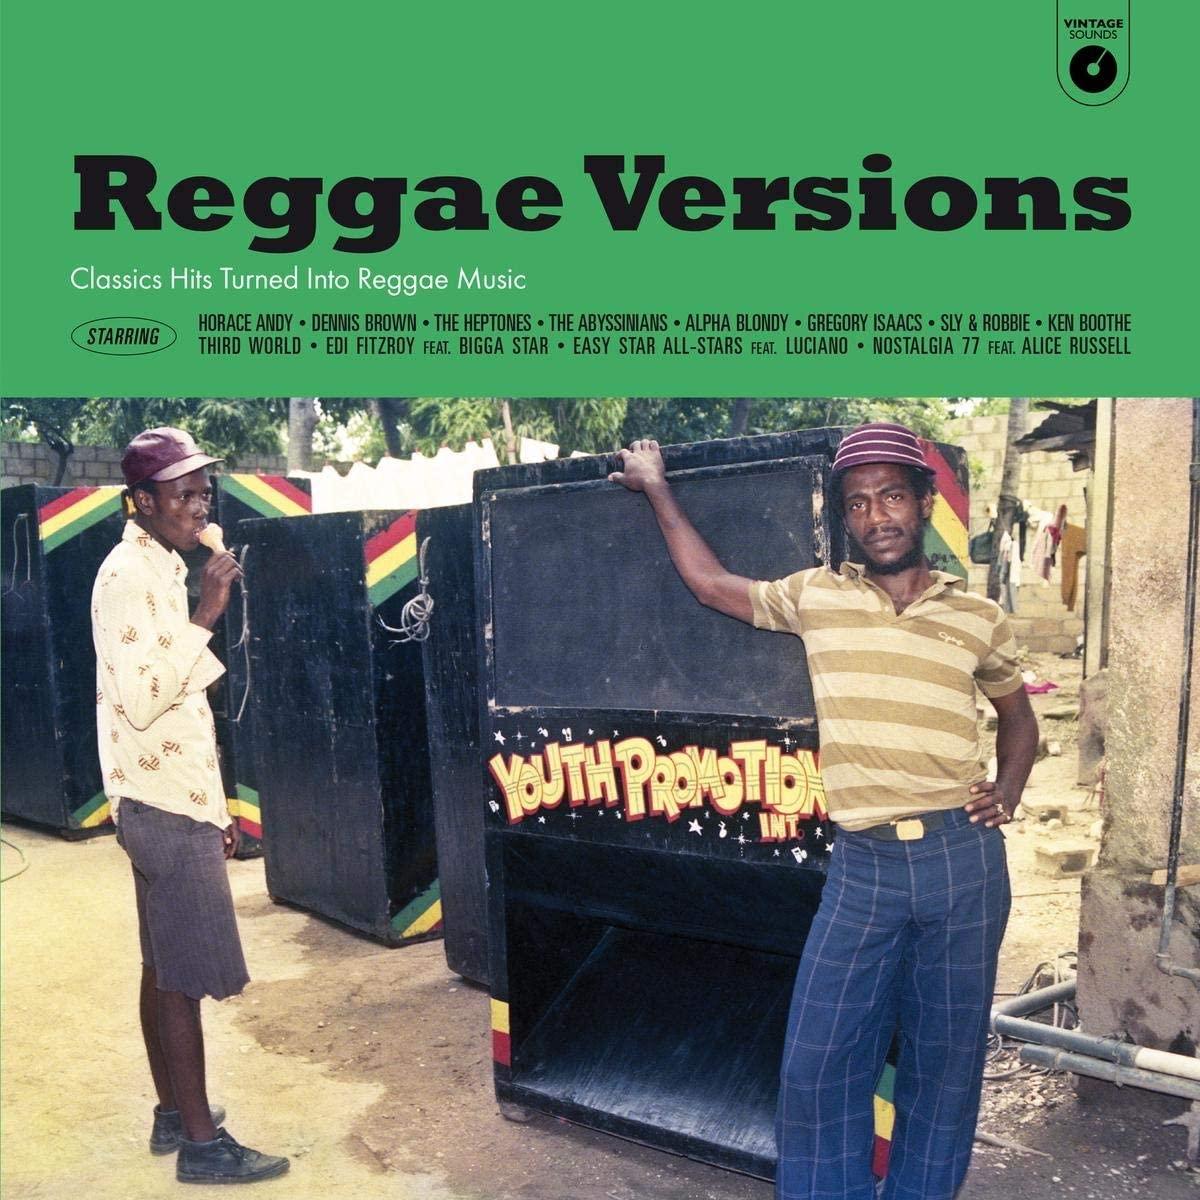 Various Artists - Reggae Versions Vinyl £9.75 Prime / £12.74 non-Prime @ Amazon